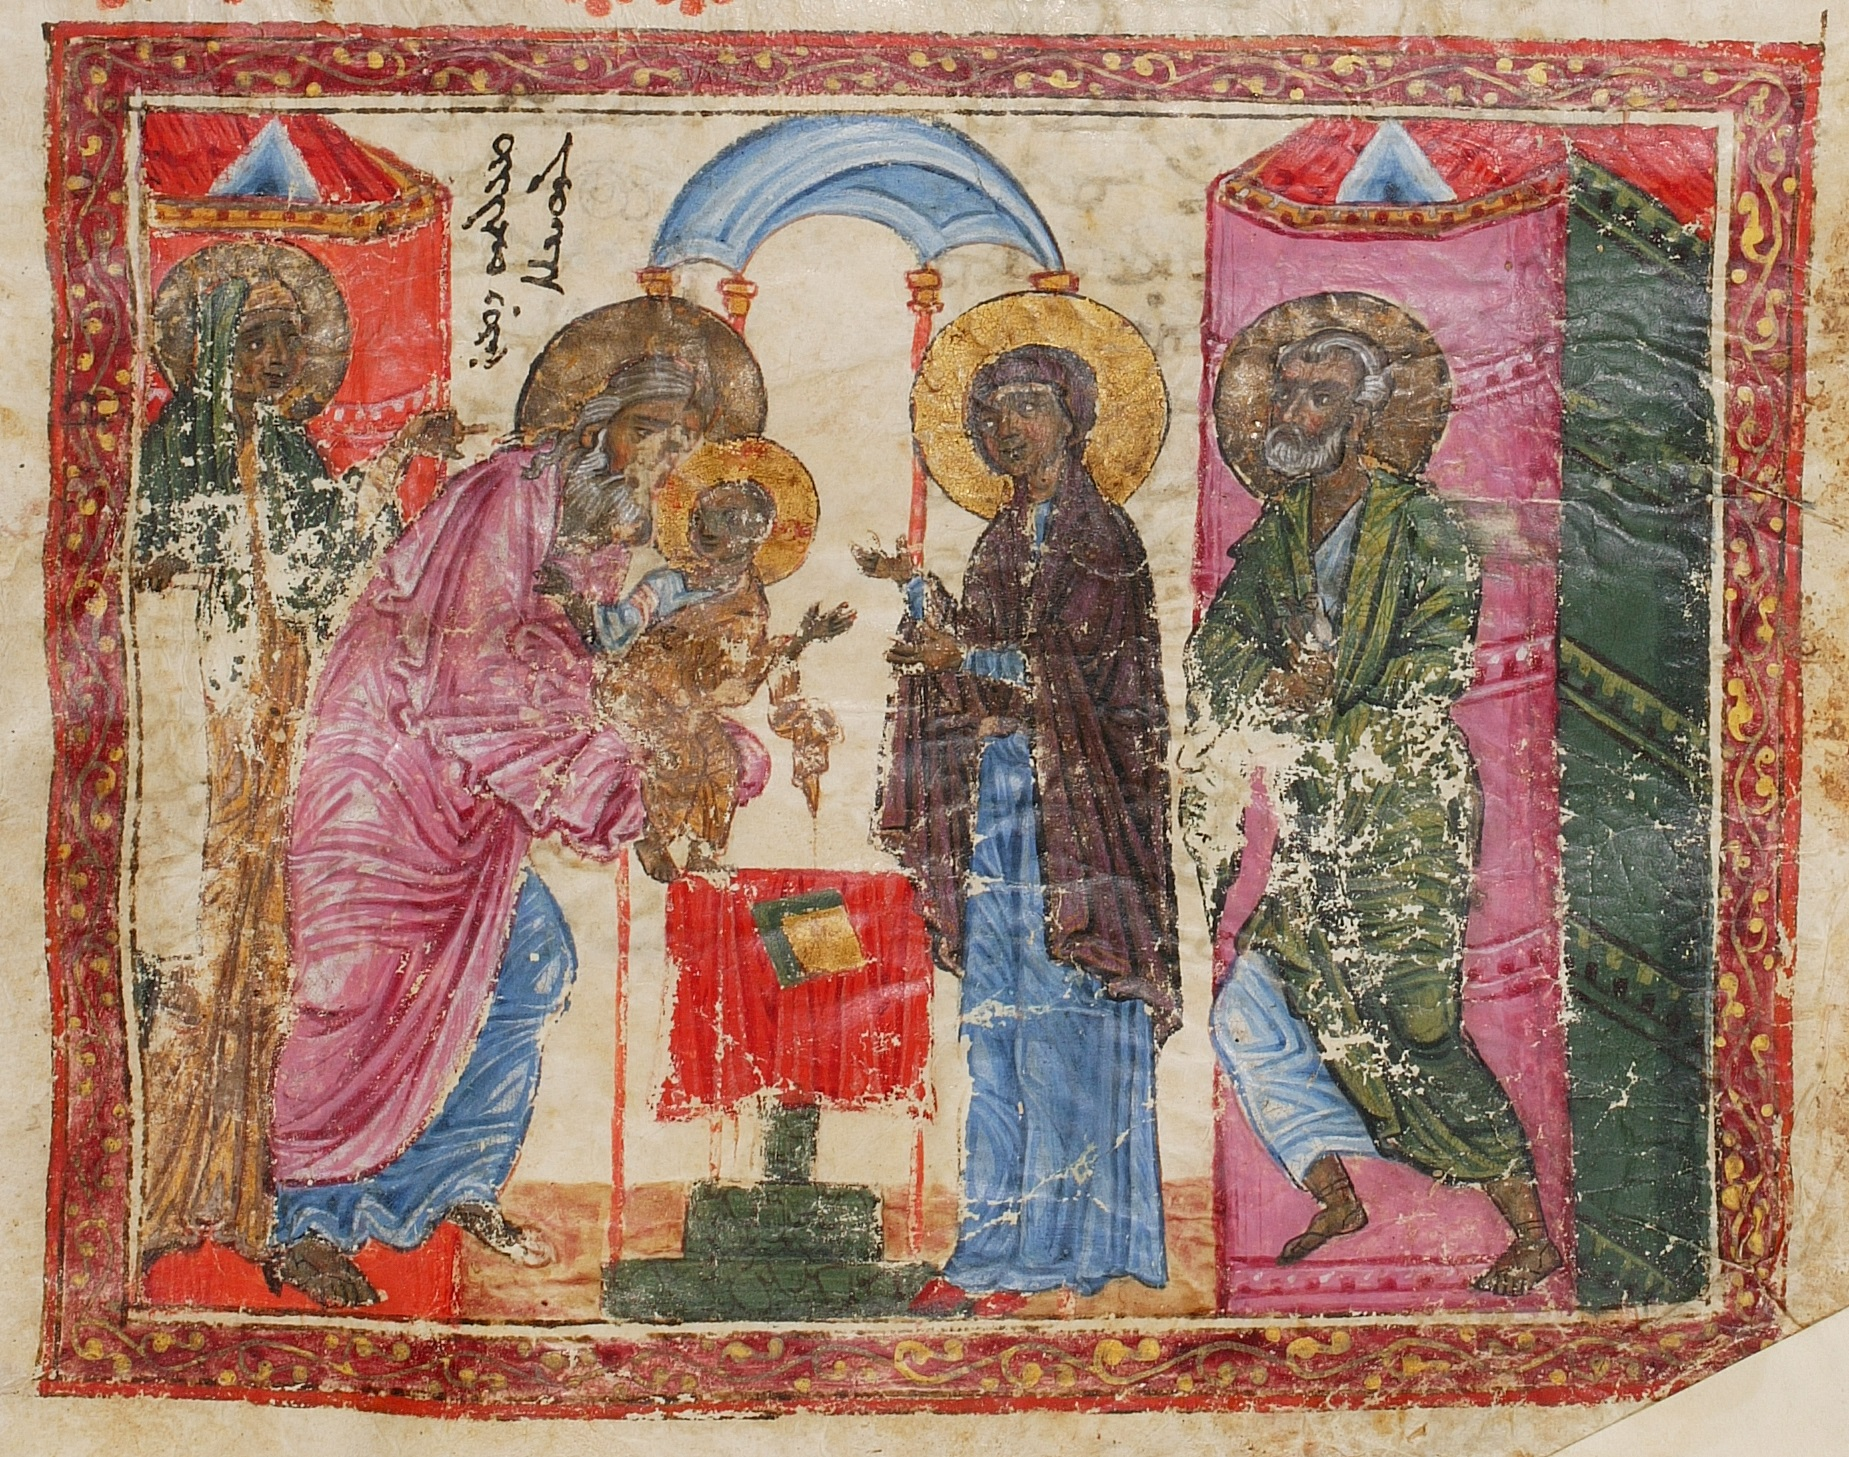 CFMM 41, f. 51v [13th c.]